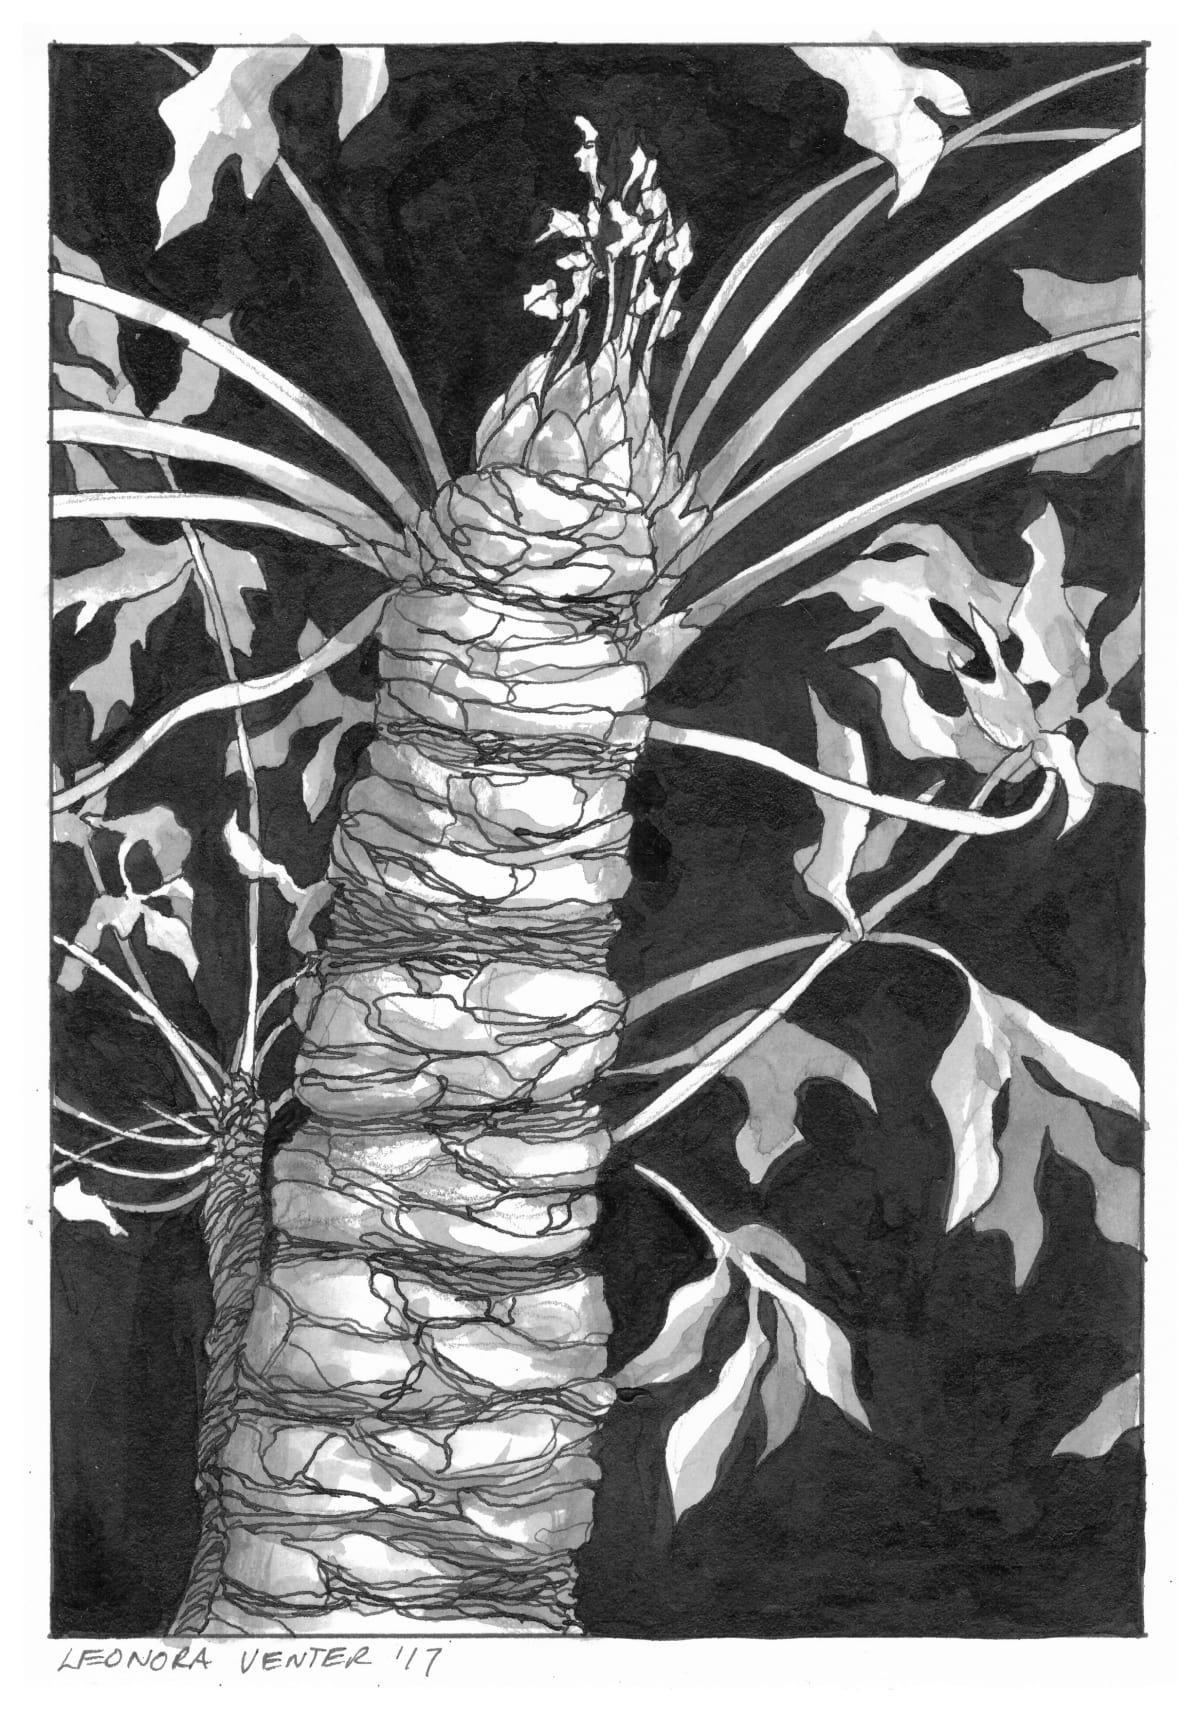 Leonora Venter, Cabbage Tree (Cussonia), 2017